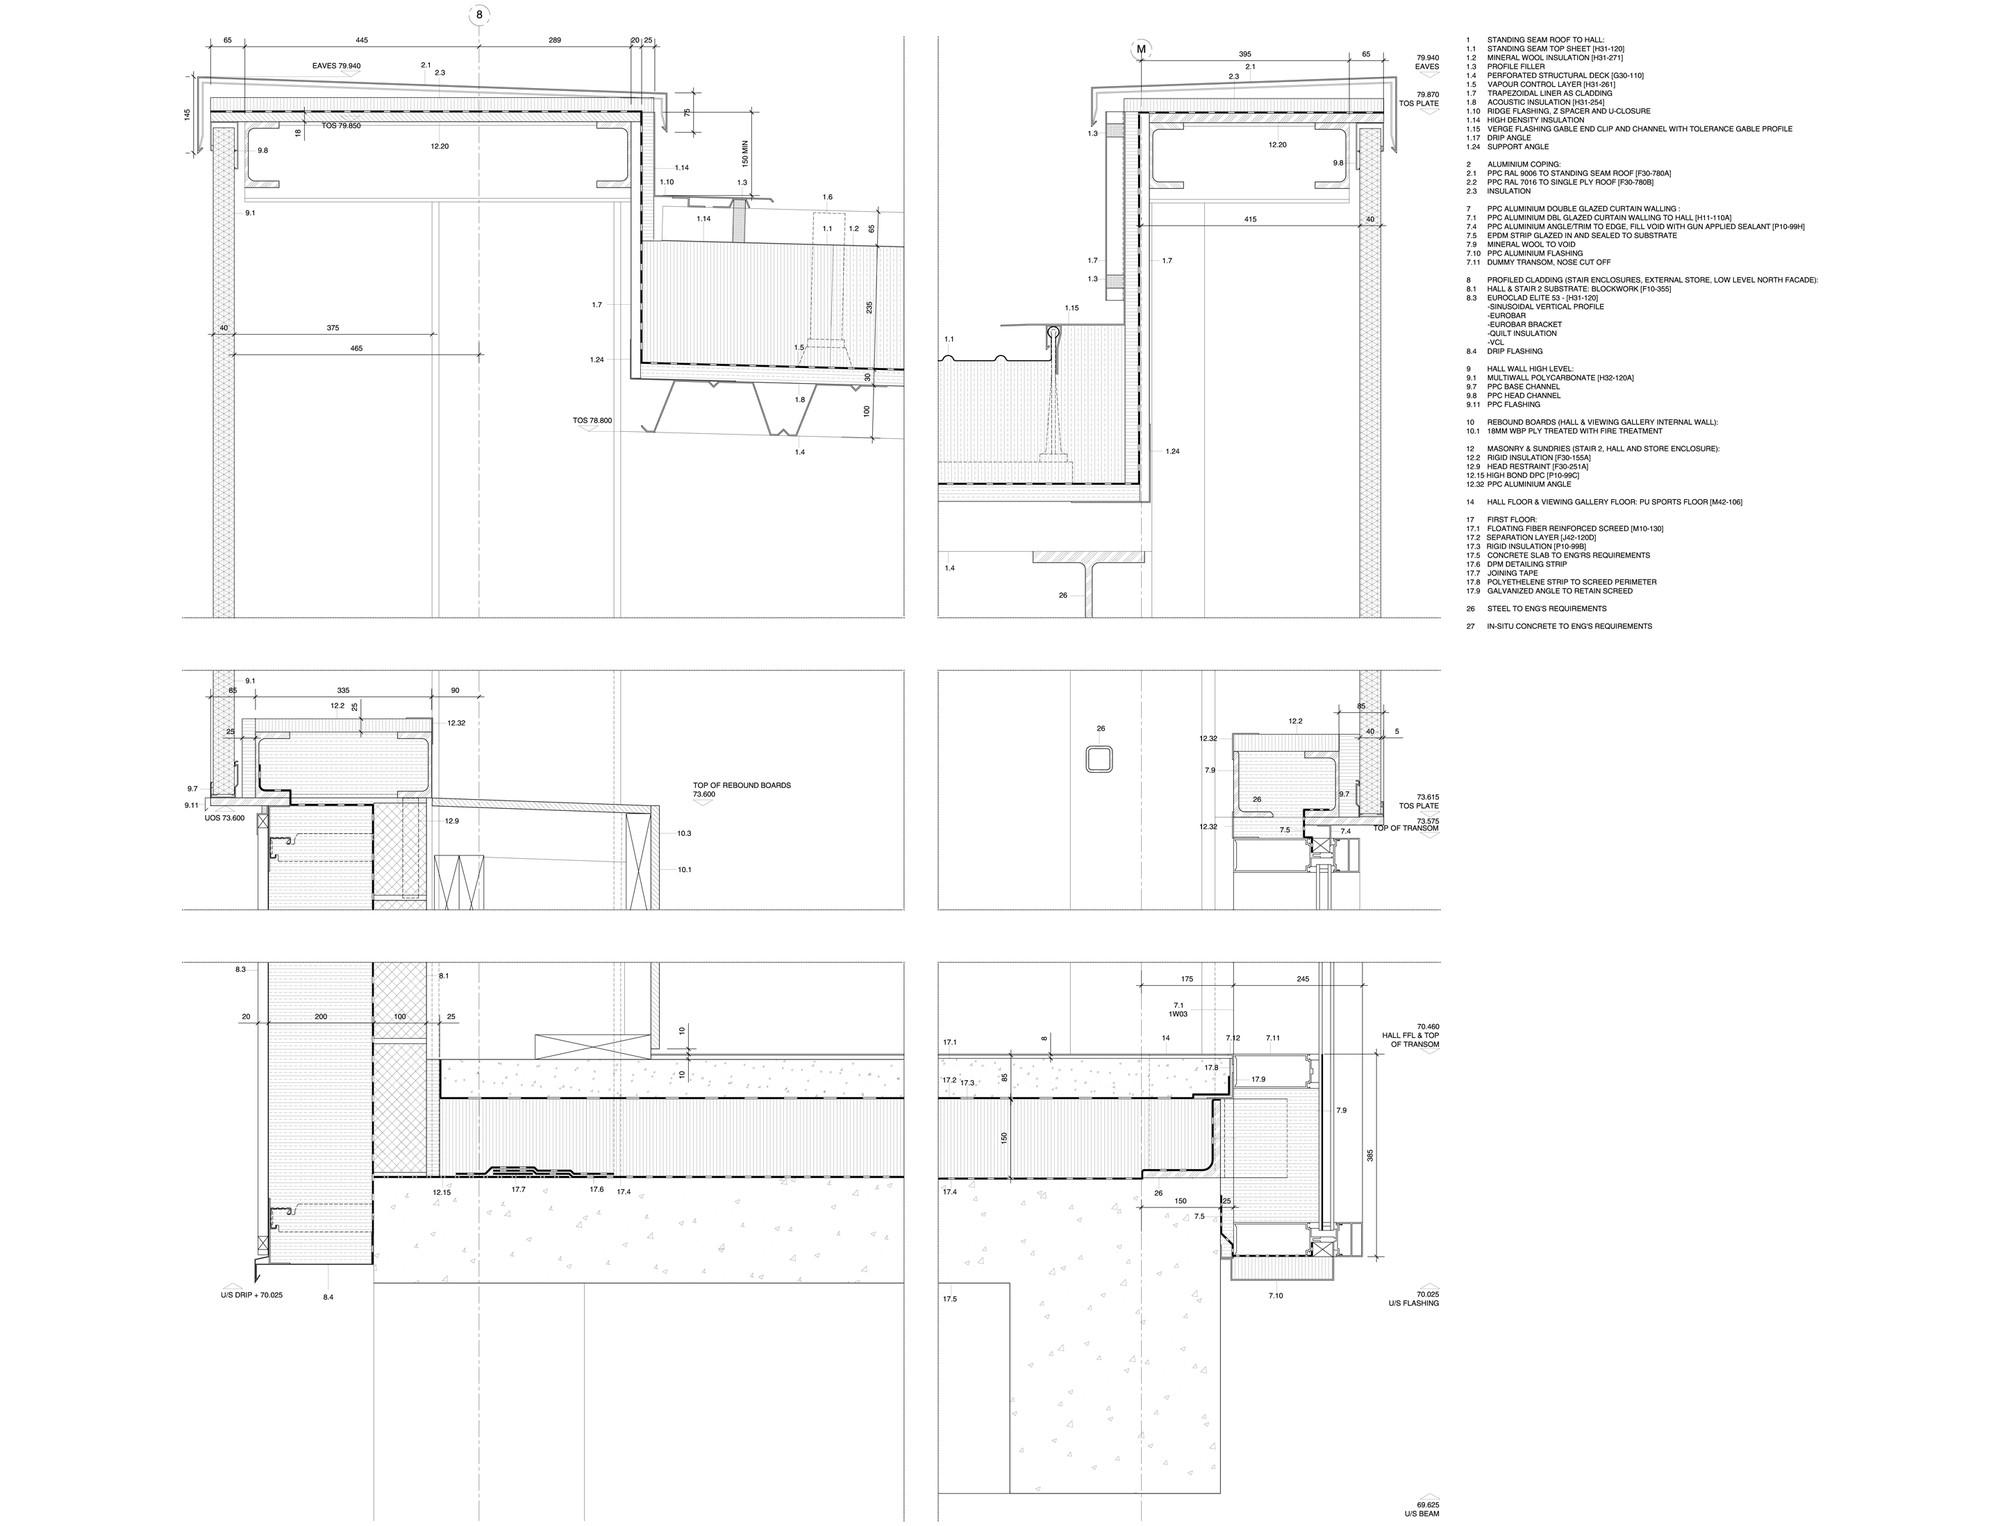 Gallery of Haydon Activity Hall / Nick Baker Architects - 28 on